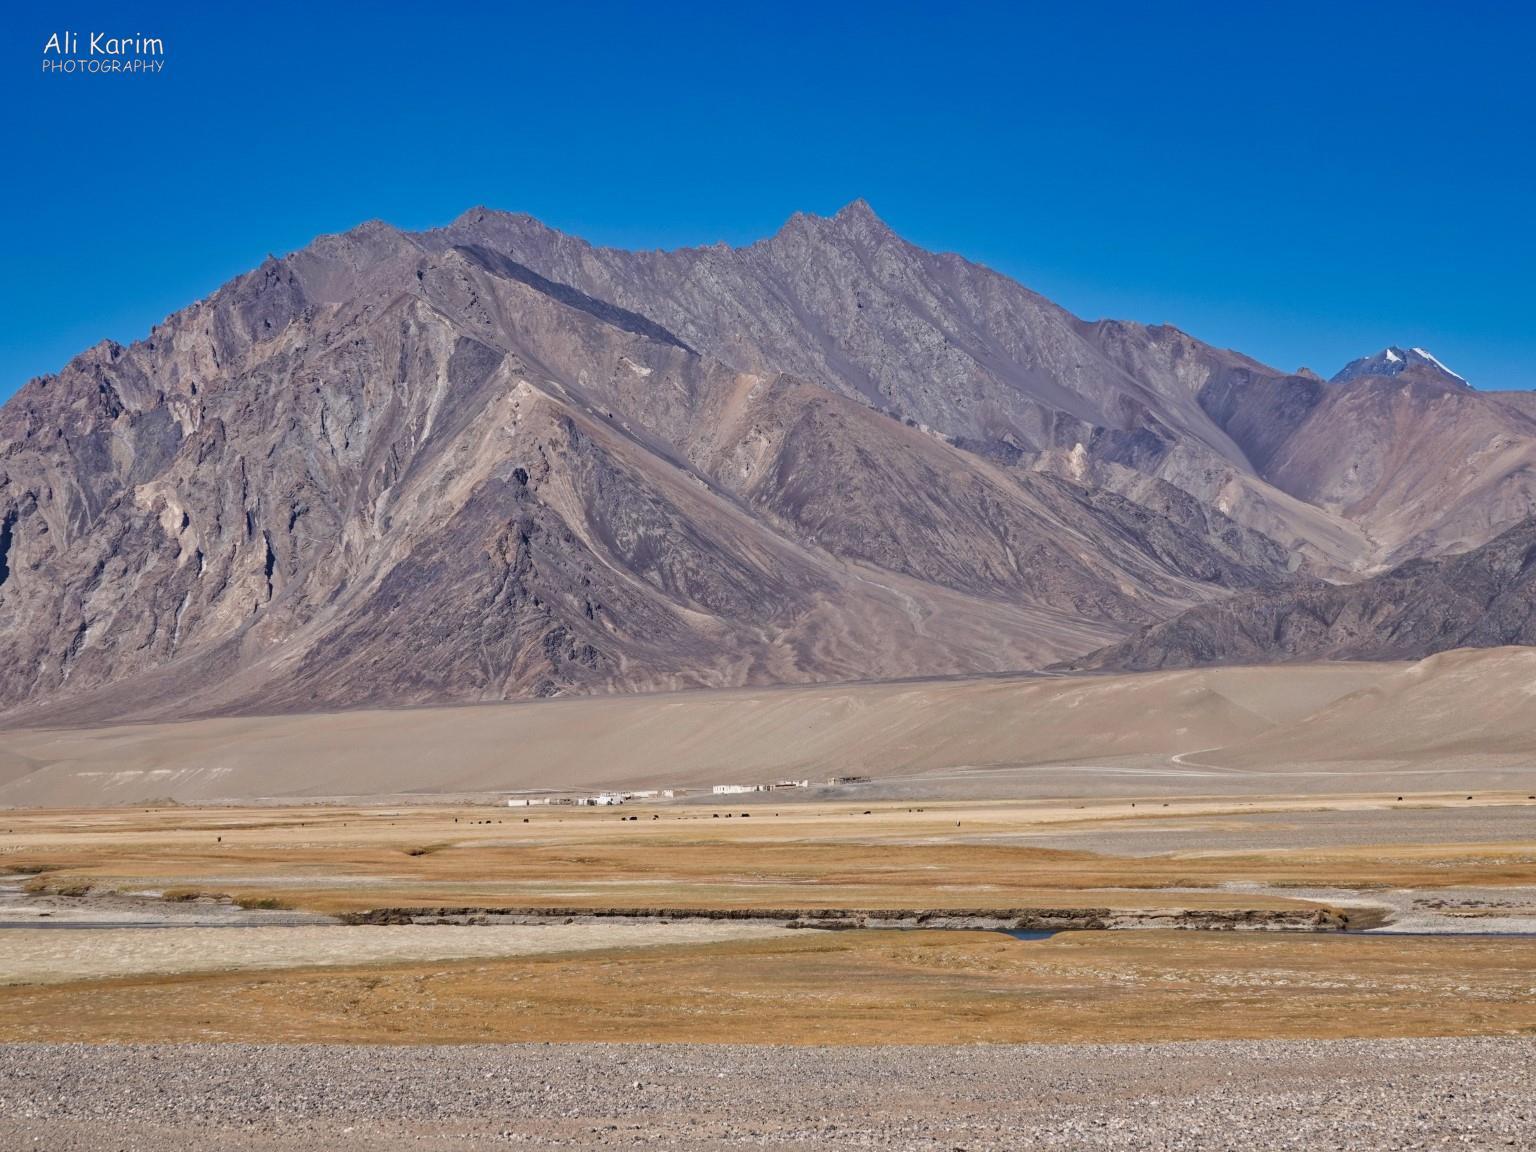 More Murghab & Alichur, Tajikistan, Remote settlement along the highway